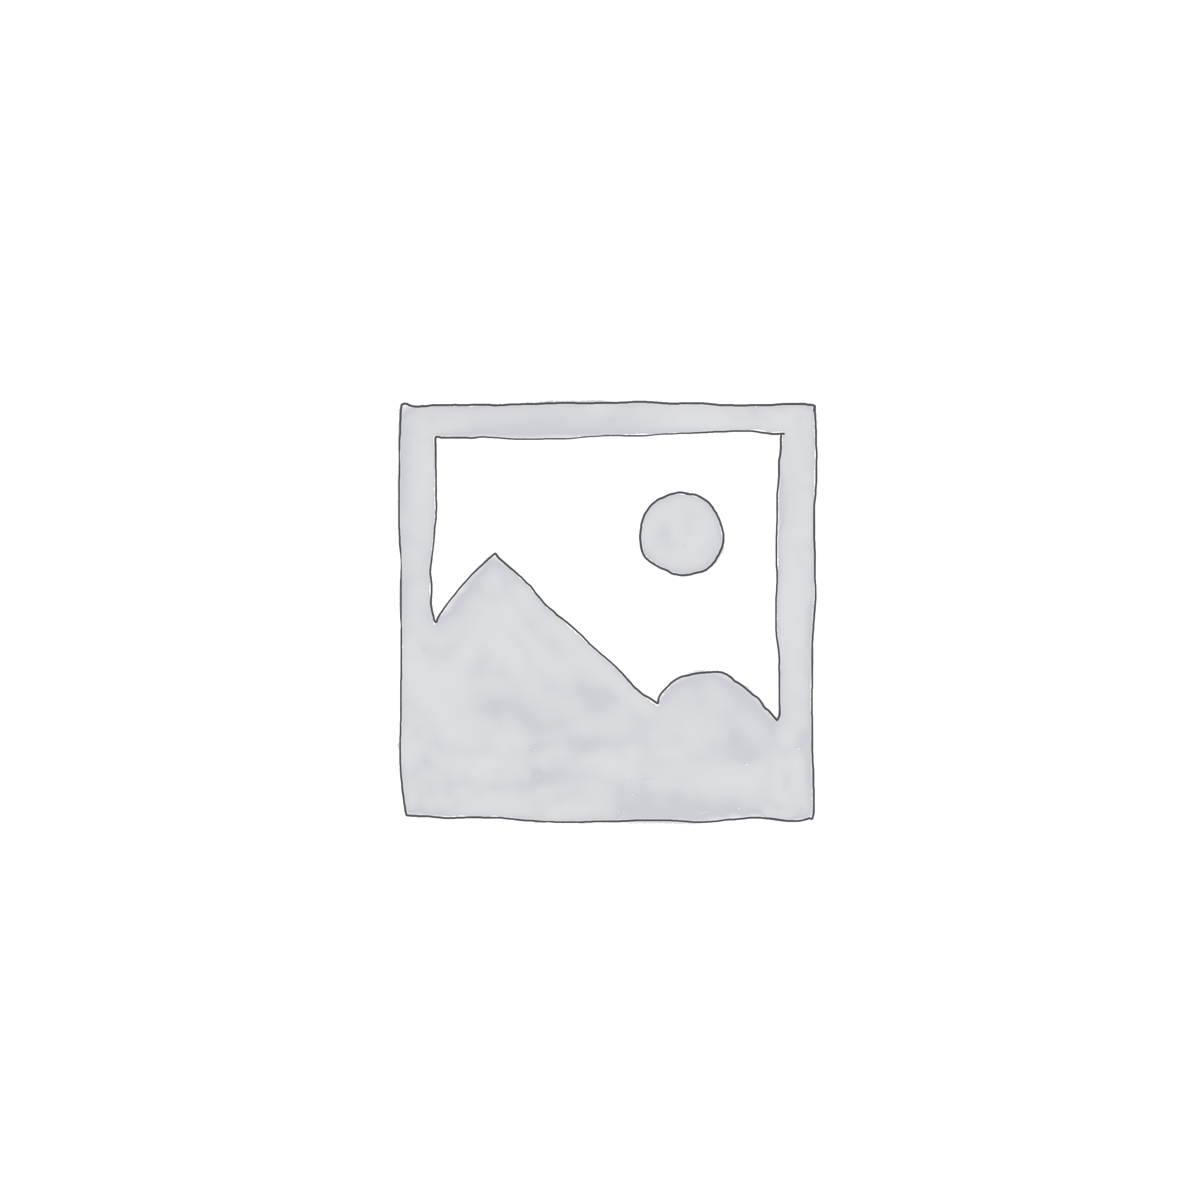 Halolux 240volt (ES/E27 Screw Caps) Clear